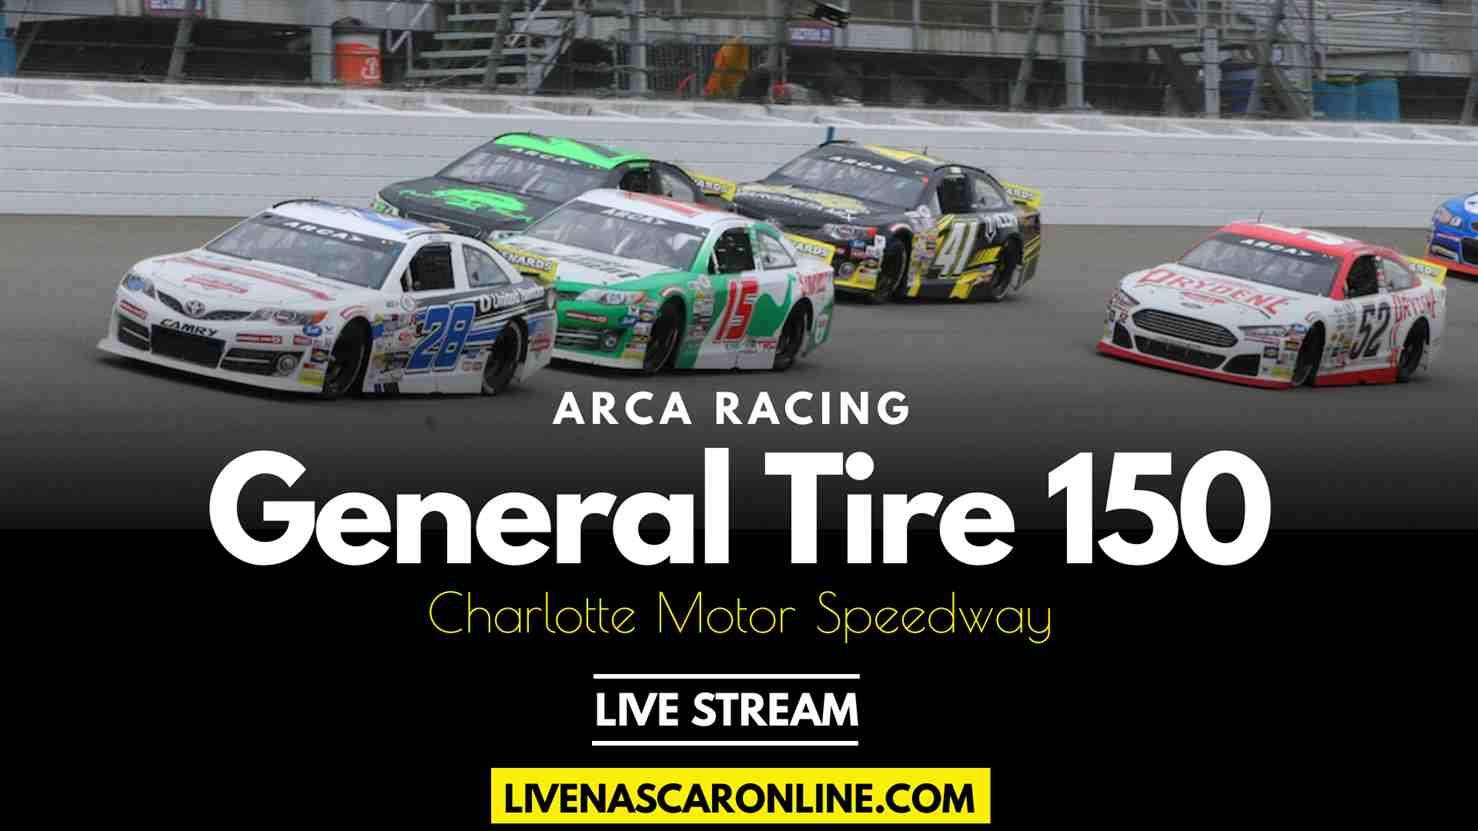 ARCA General Tire 150 Live Stream 2021